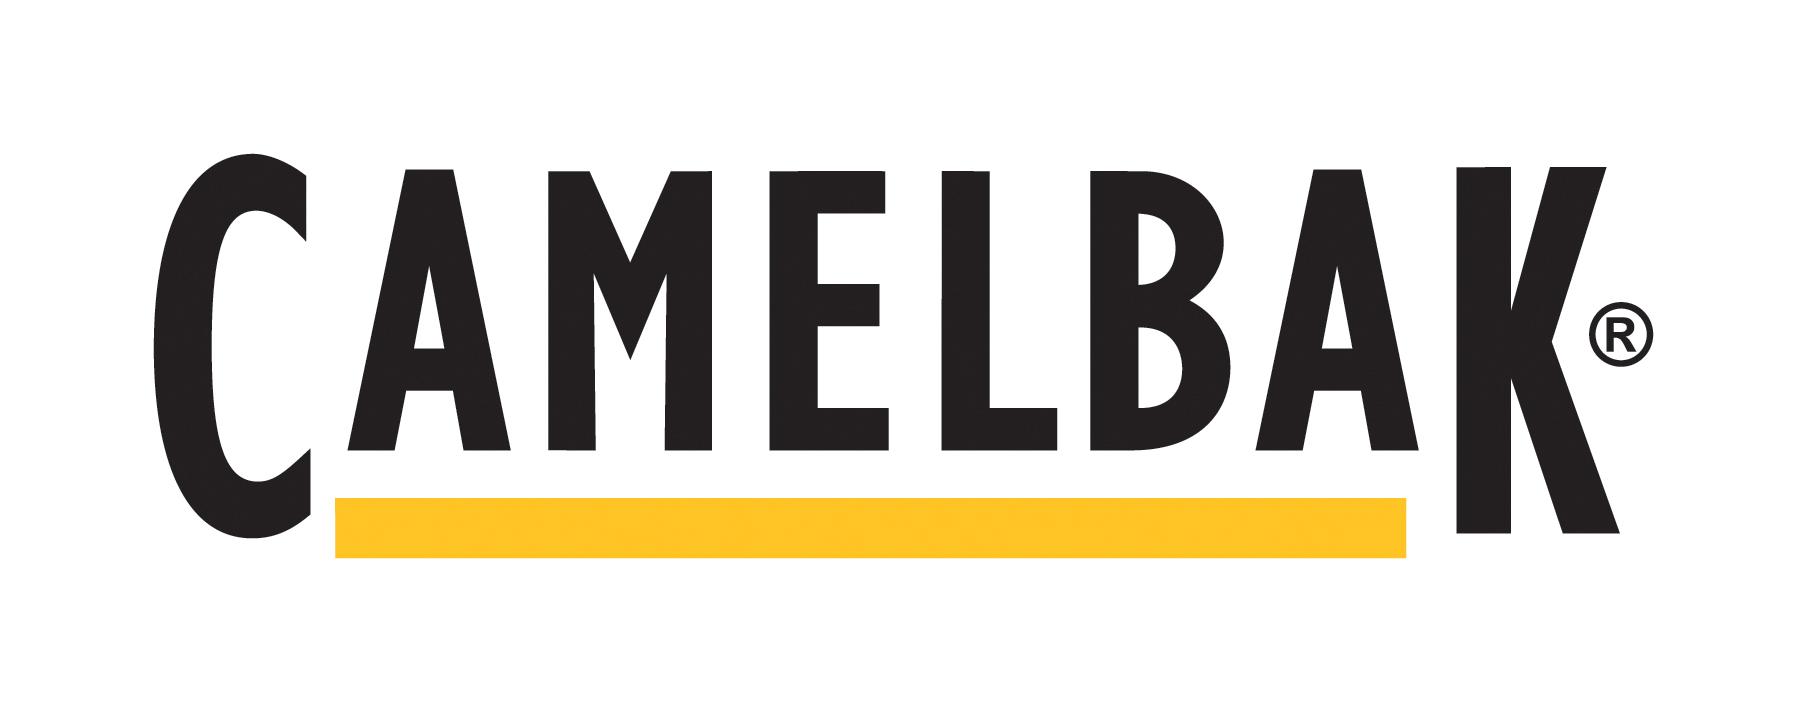 001_camelbak_camping_supply_logo.jpg